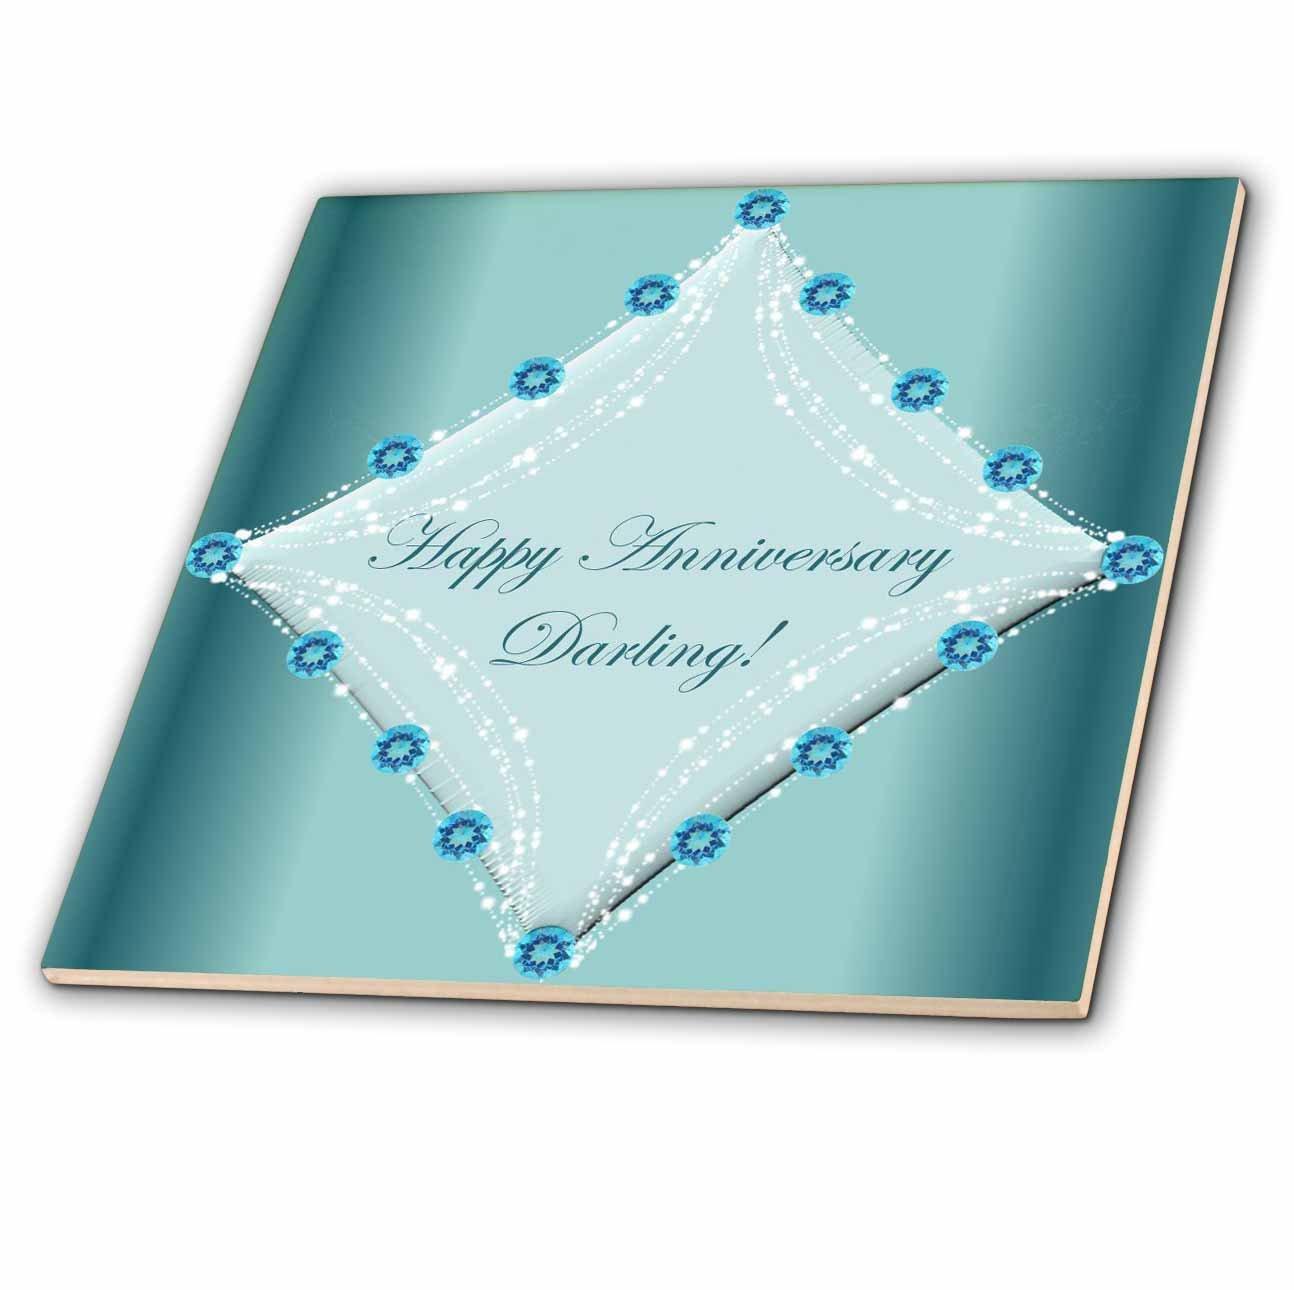 6-Inch 3dRose ct/_33042/_2 Happy Anniversary Darling-Ceramic Tile